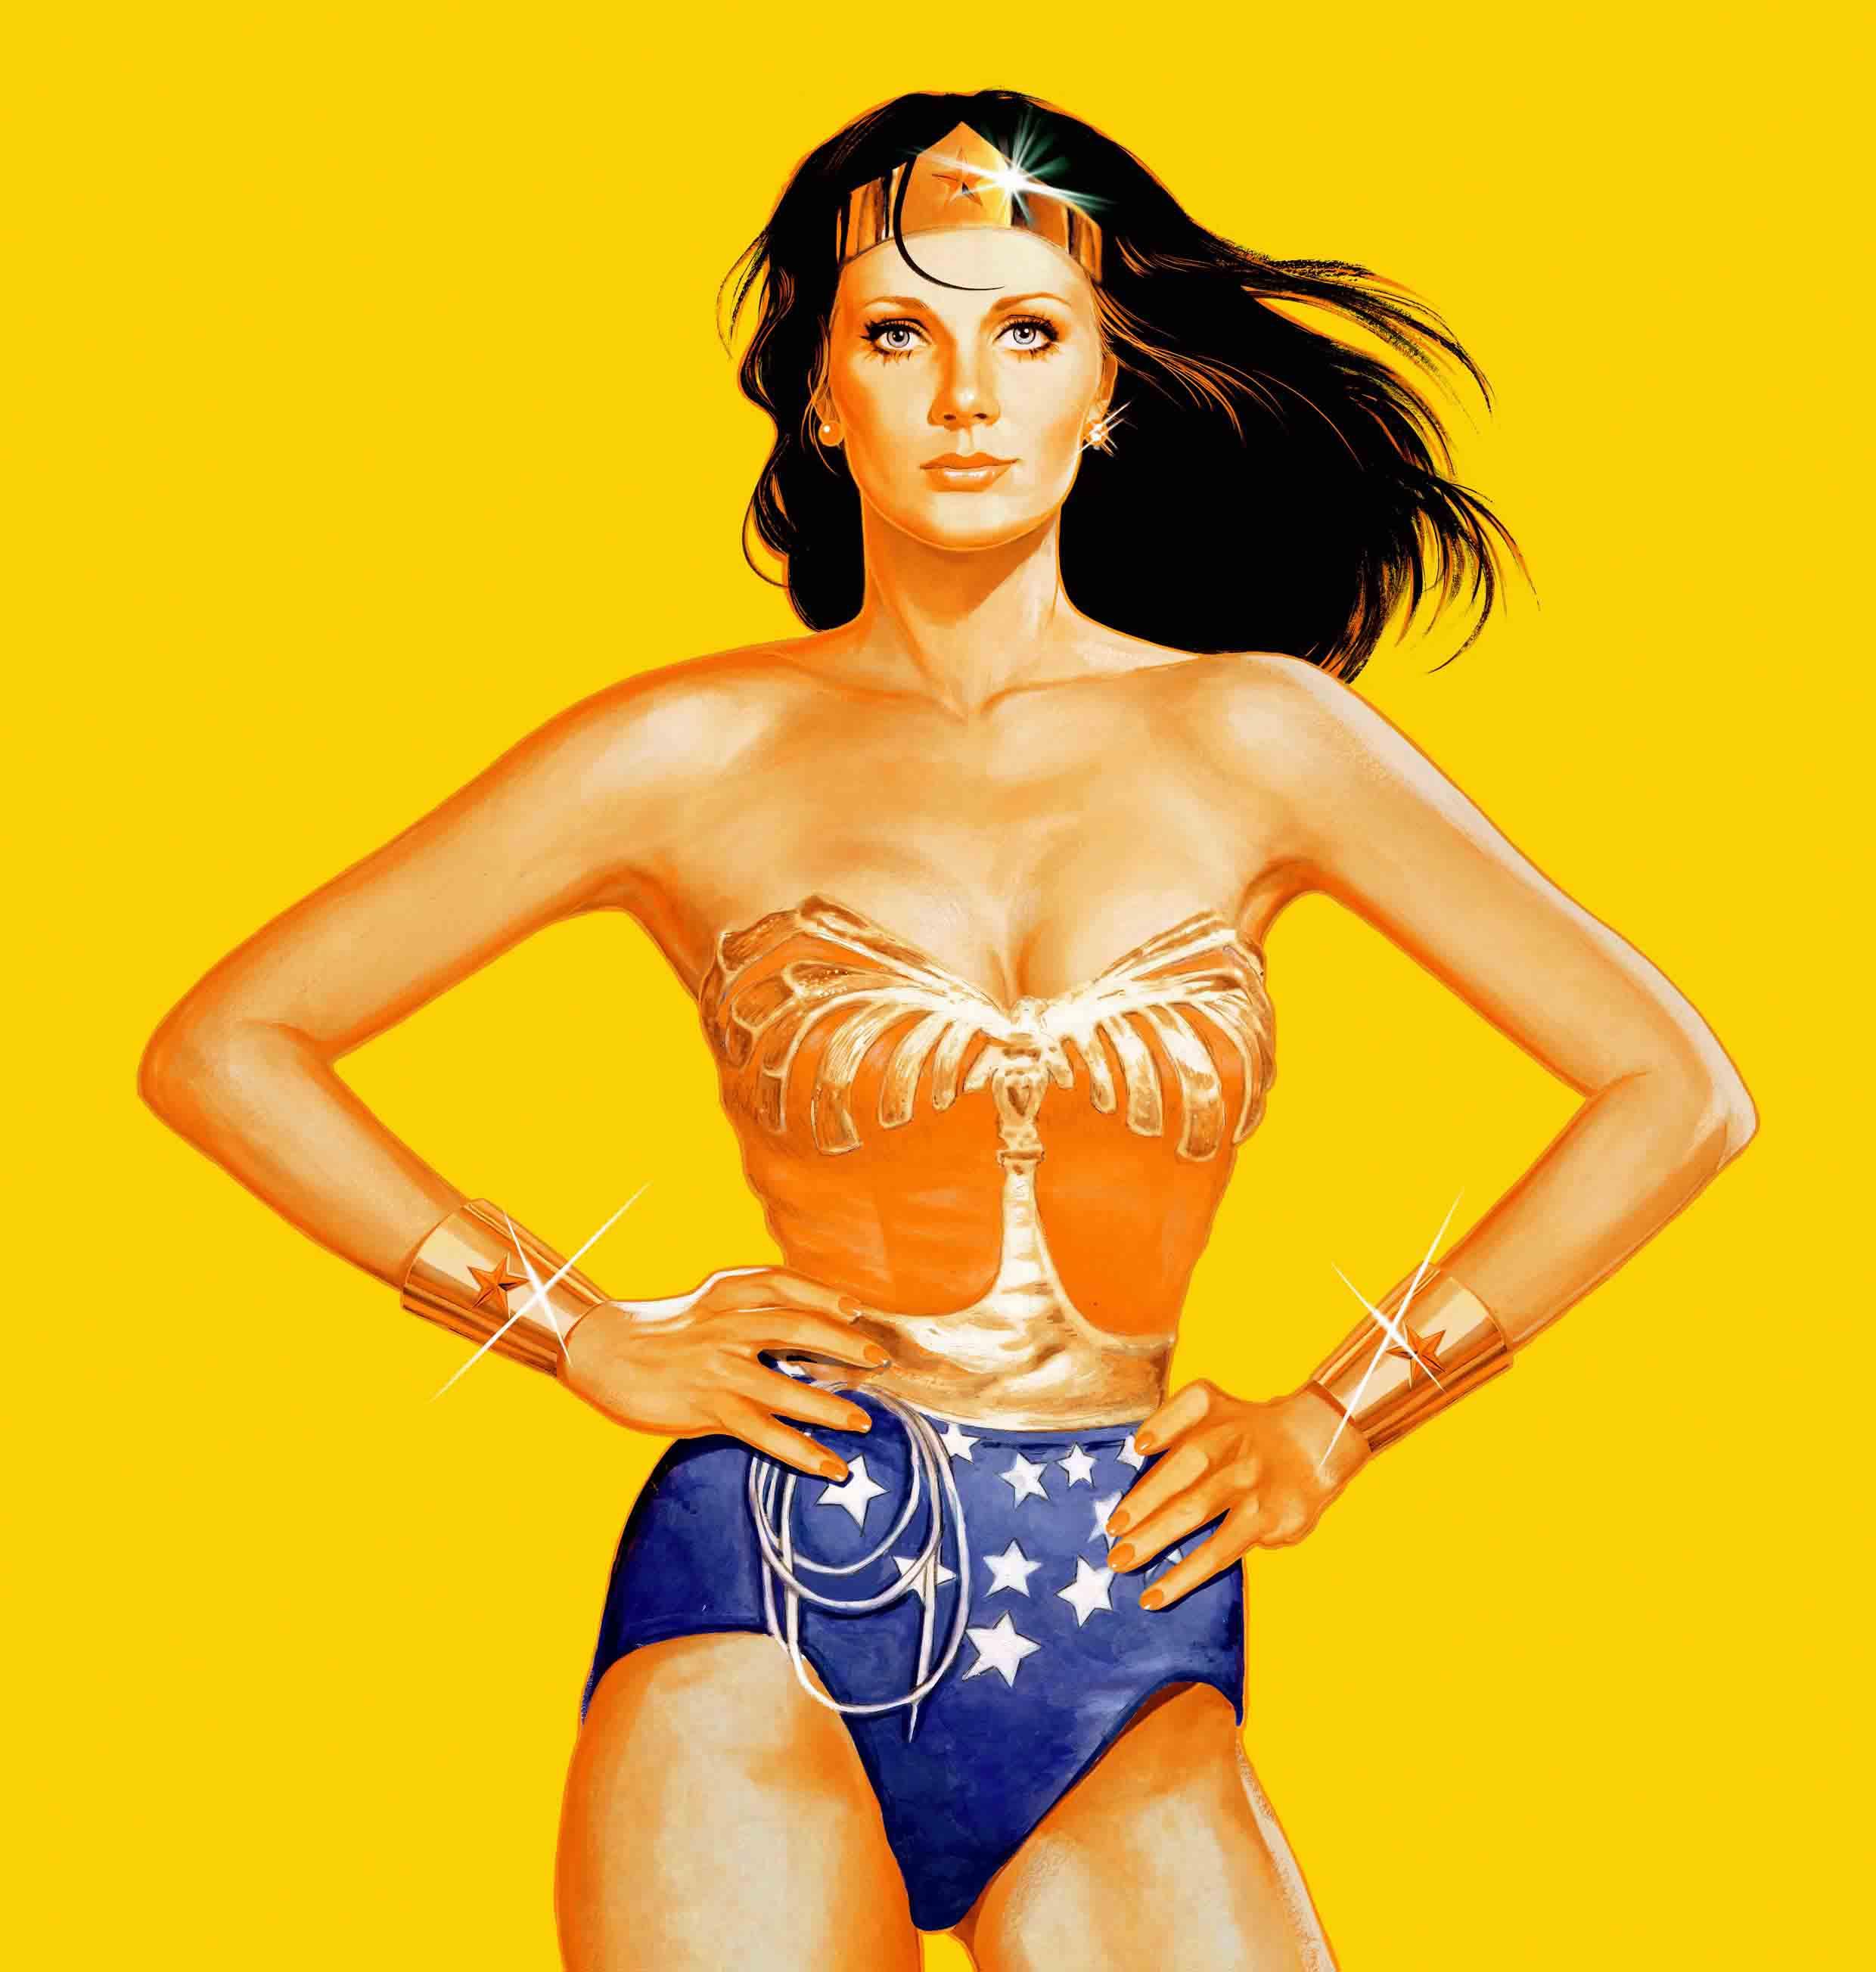 Wonder Woman Lynda Carter Yellow version Art By John Keaveney  low res.jpg